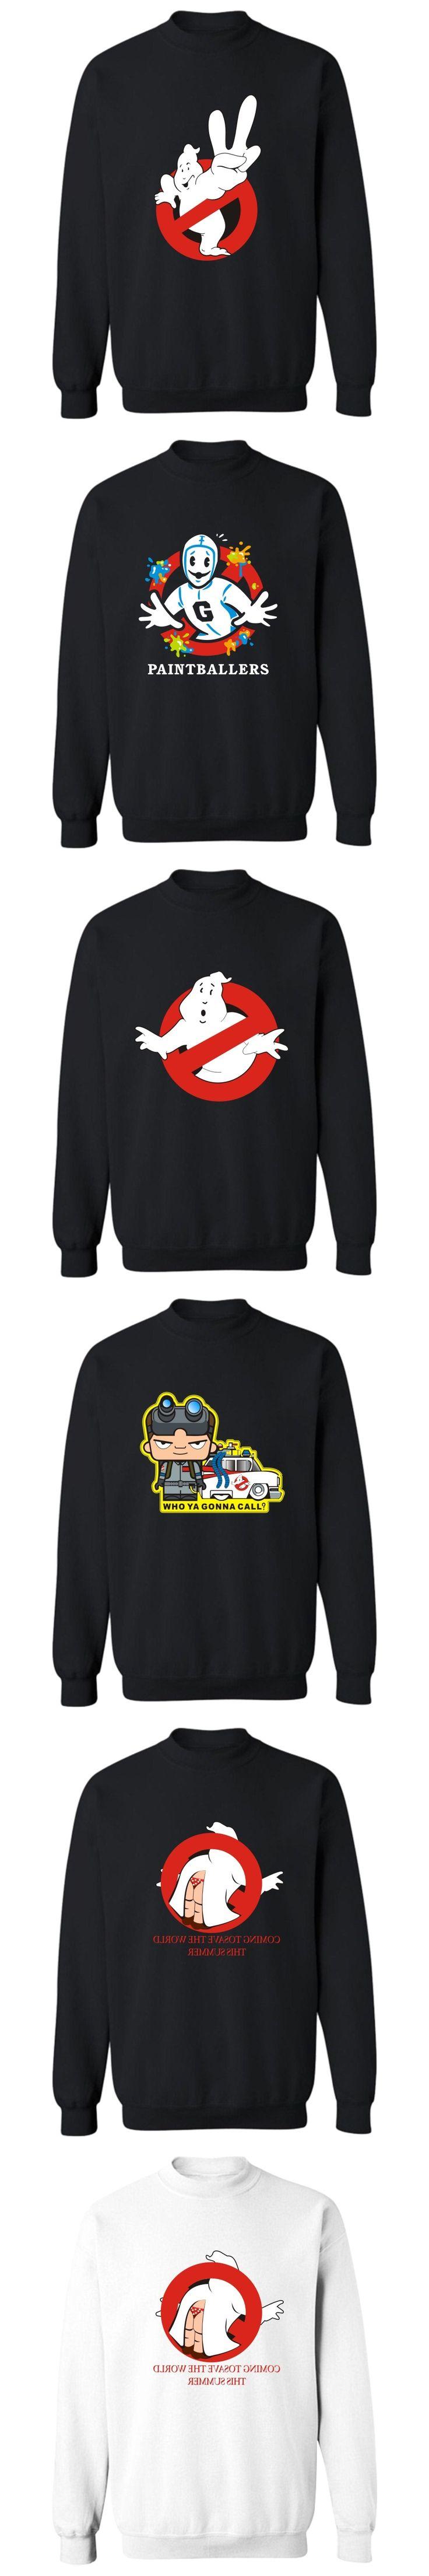 Ghostbusters Harajuku Capless Sweatshirt Men Hip Hop Fashion Casual Mens Hoodies And Sweatshirts Funny RPG Game 4 Color Clothes